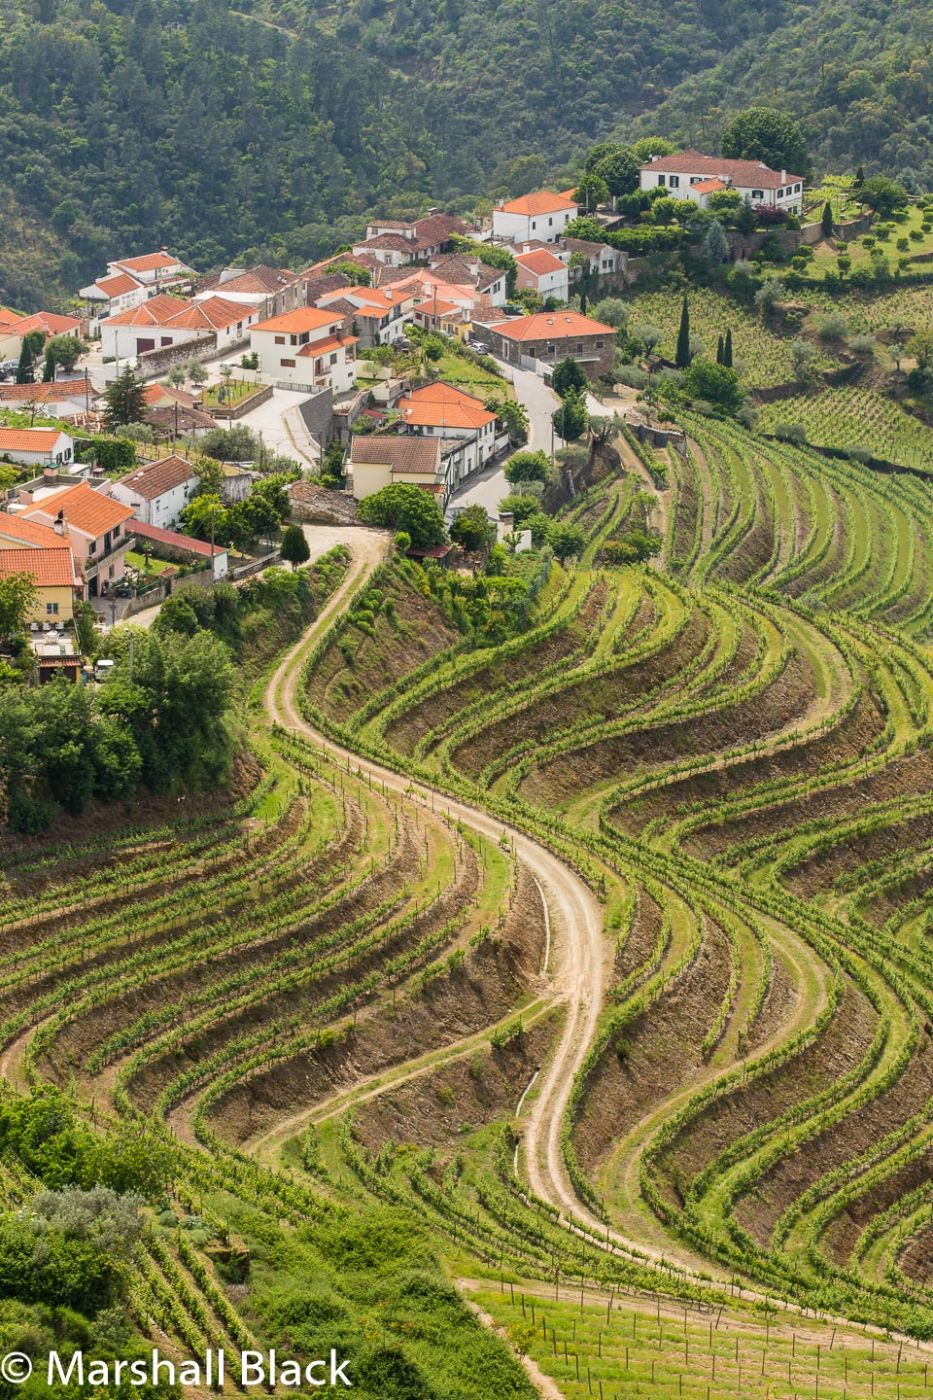 Vale de Mendiz, Alto Douro, Portugal